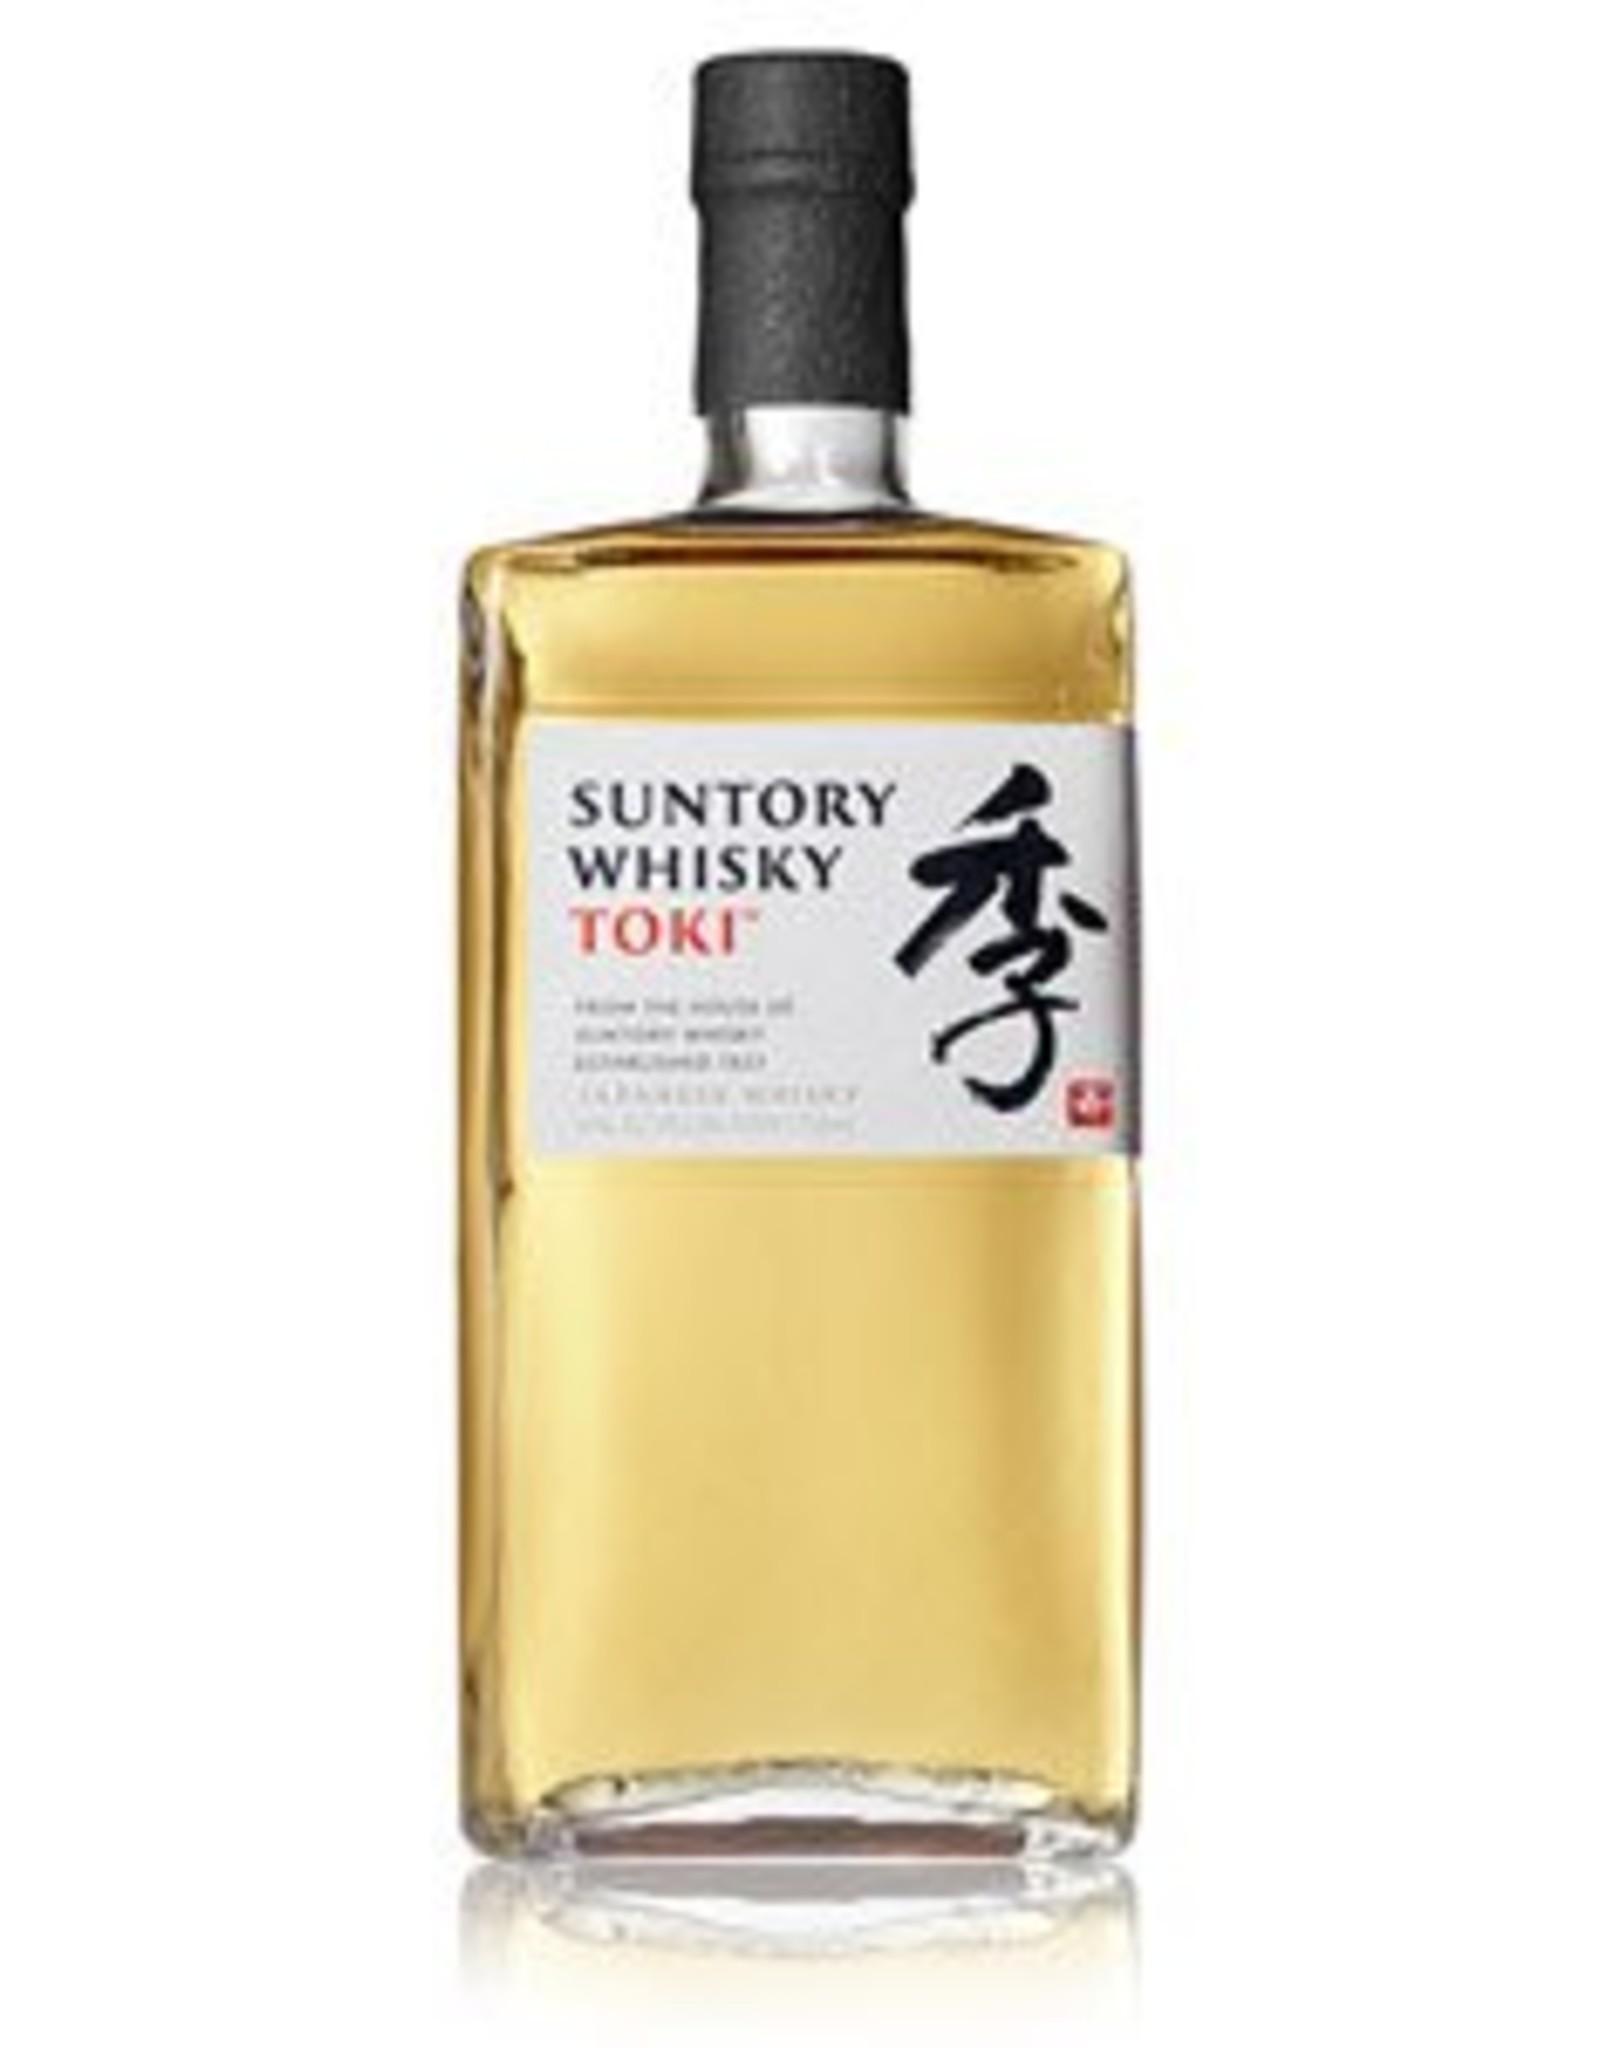 Suntory Whisky Suntory Whisky 'Toki' Japanese Whisky, Japan (750ml)